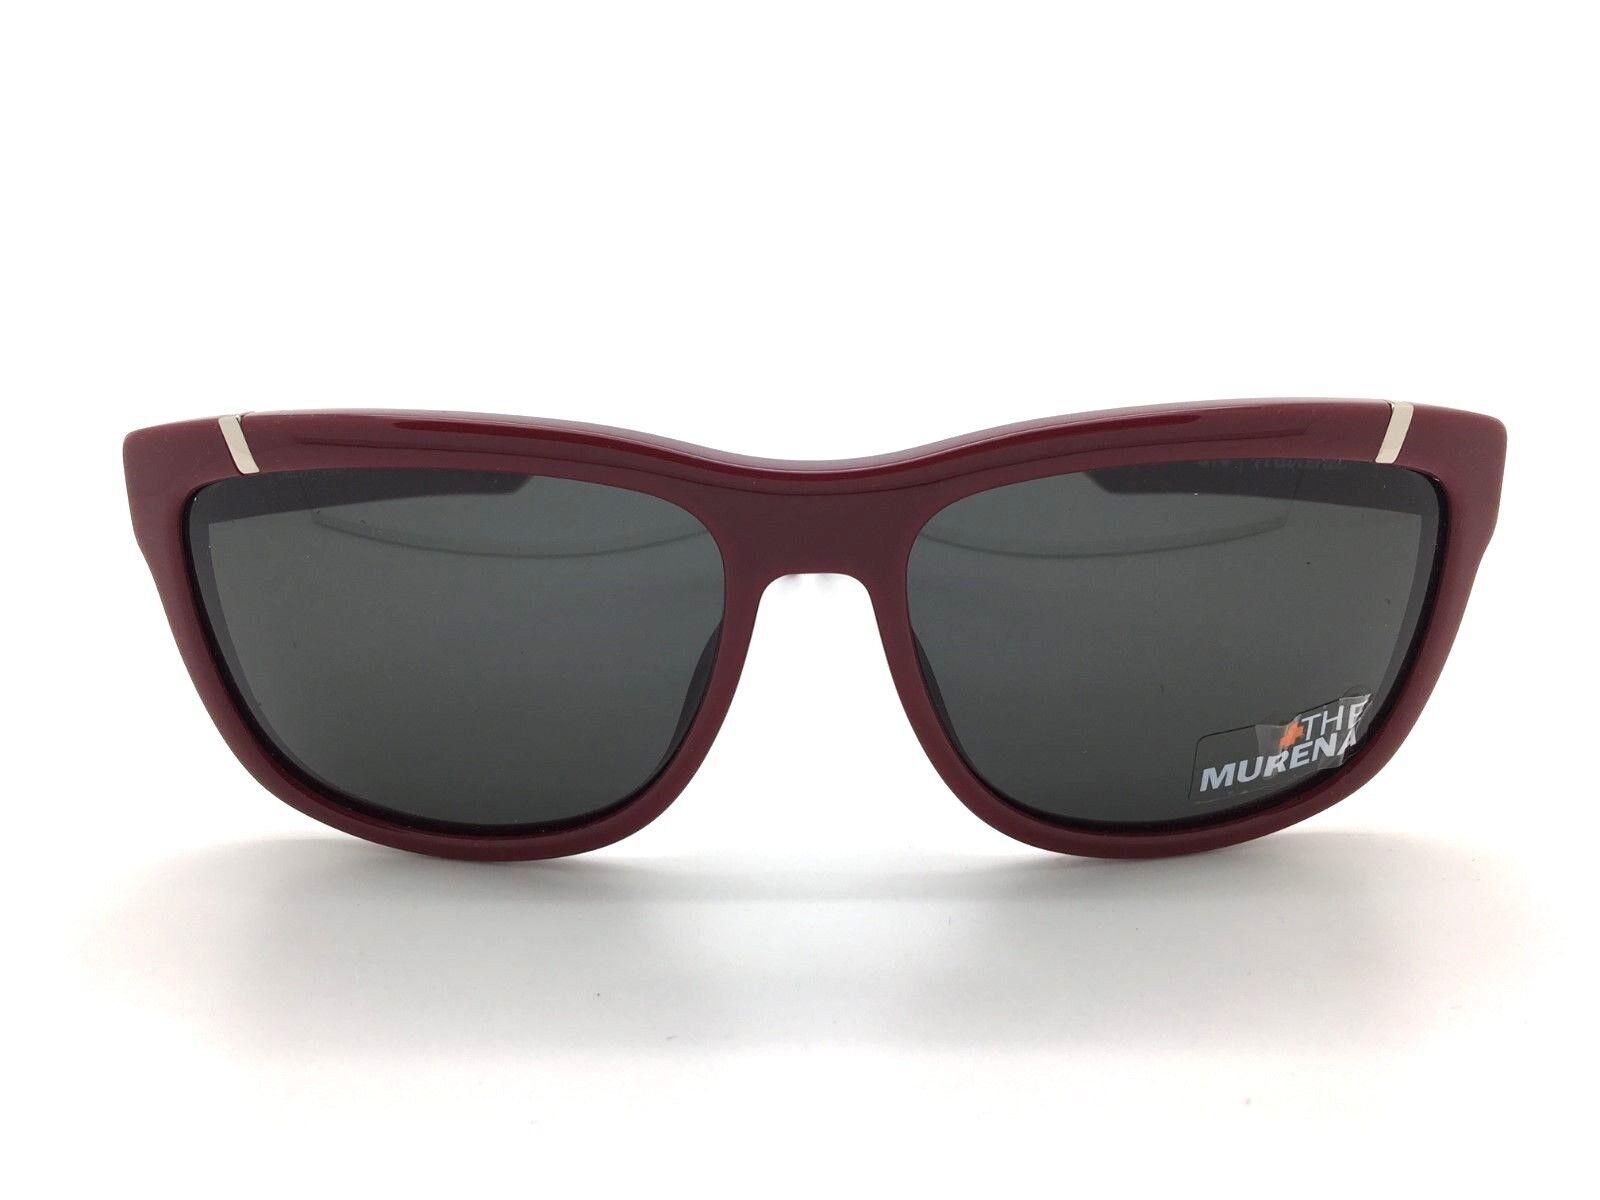 SPY+ Optic Murena Sunglasses 671012154129  Burgundy Frame with Grey Lens  order now enjoy big discount